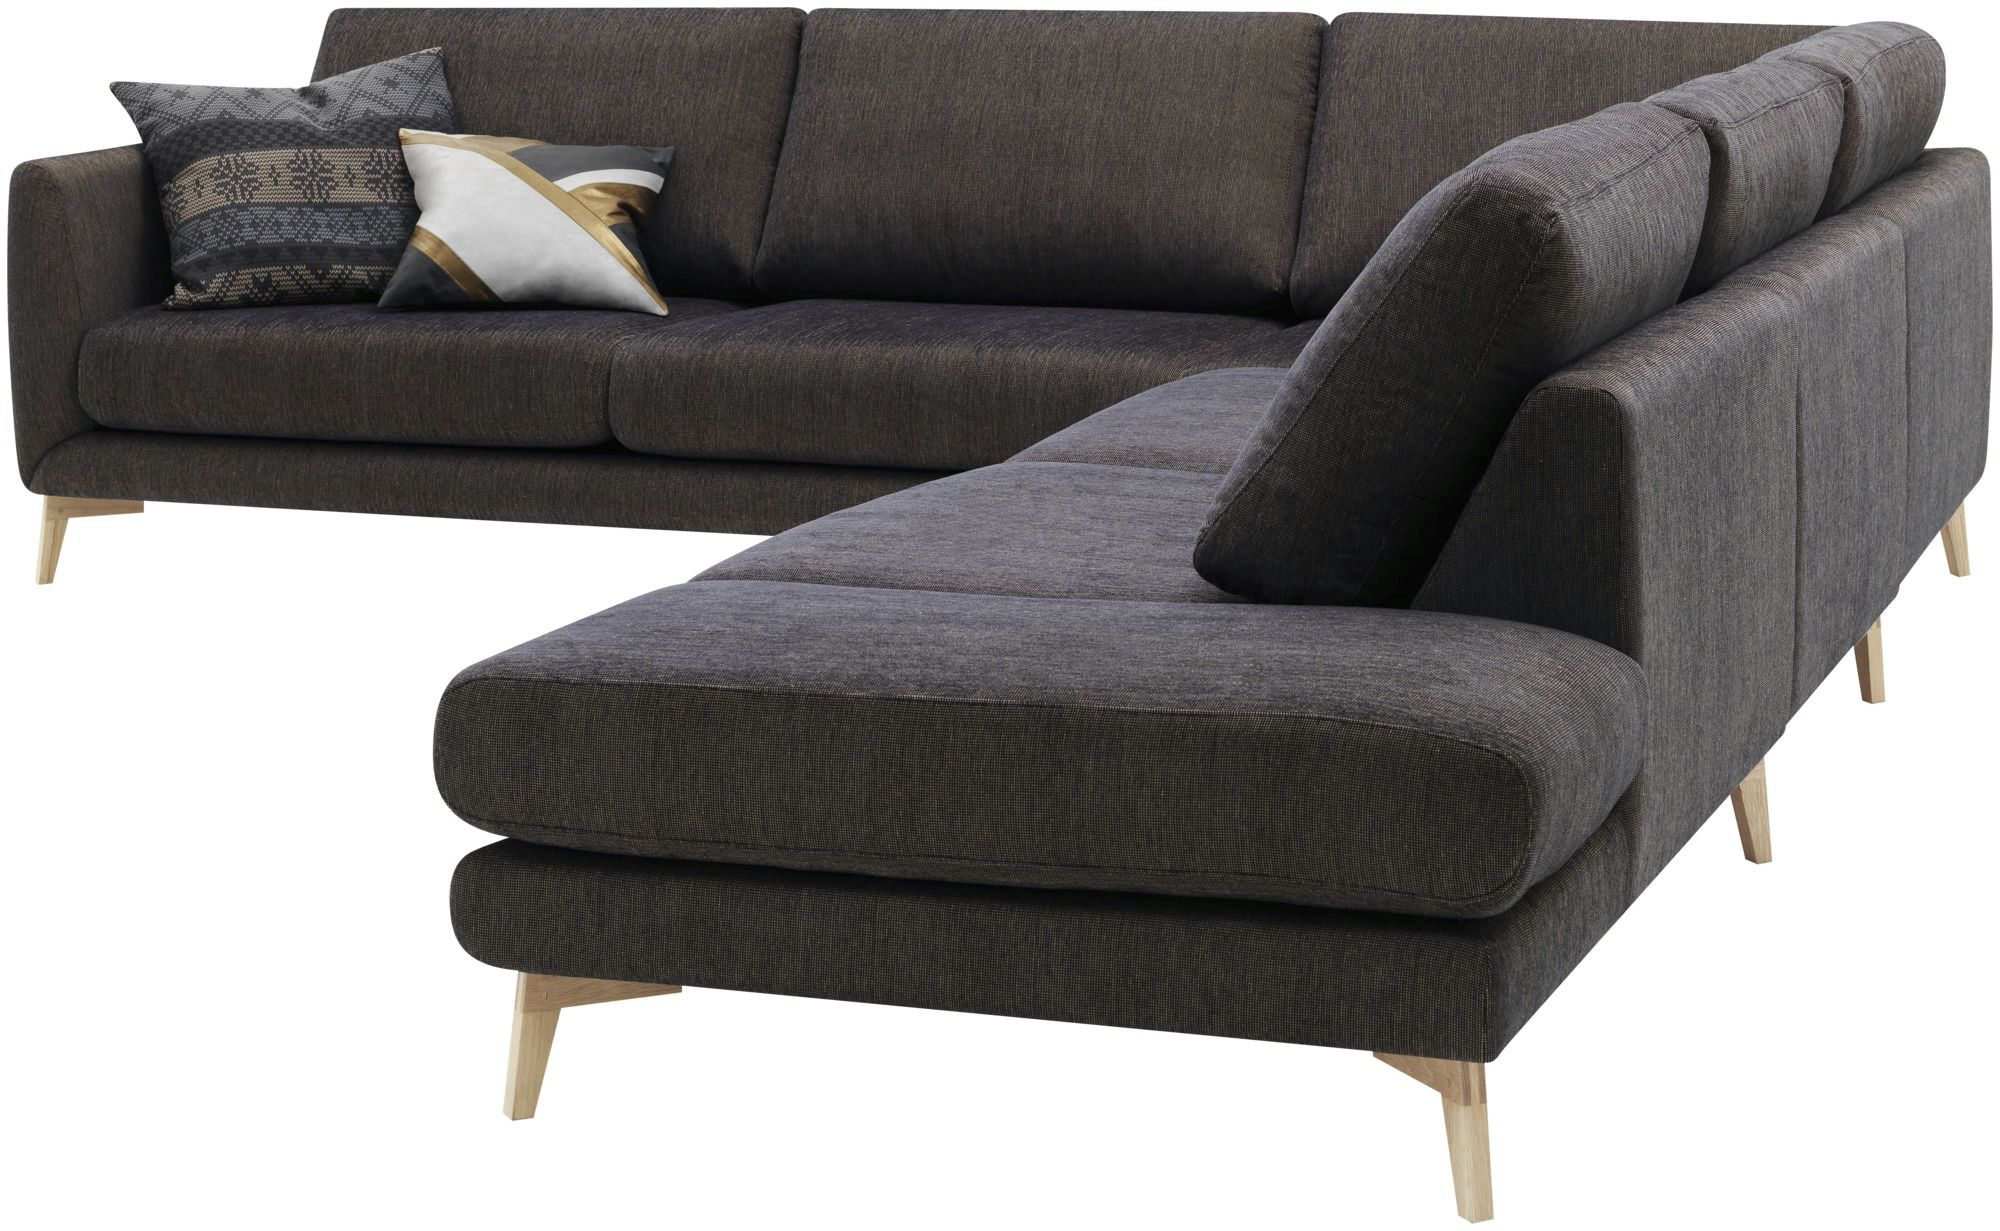 Corner sofa modular contemporary leather FARGO by Anders